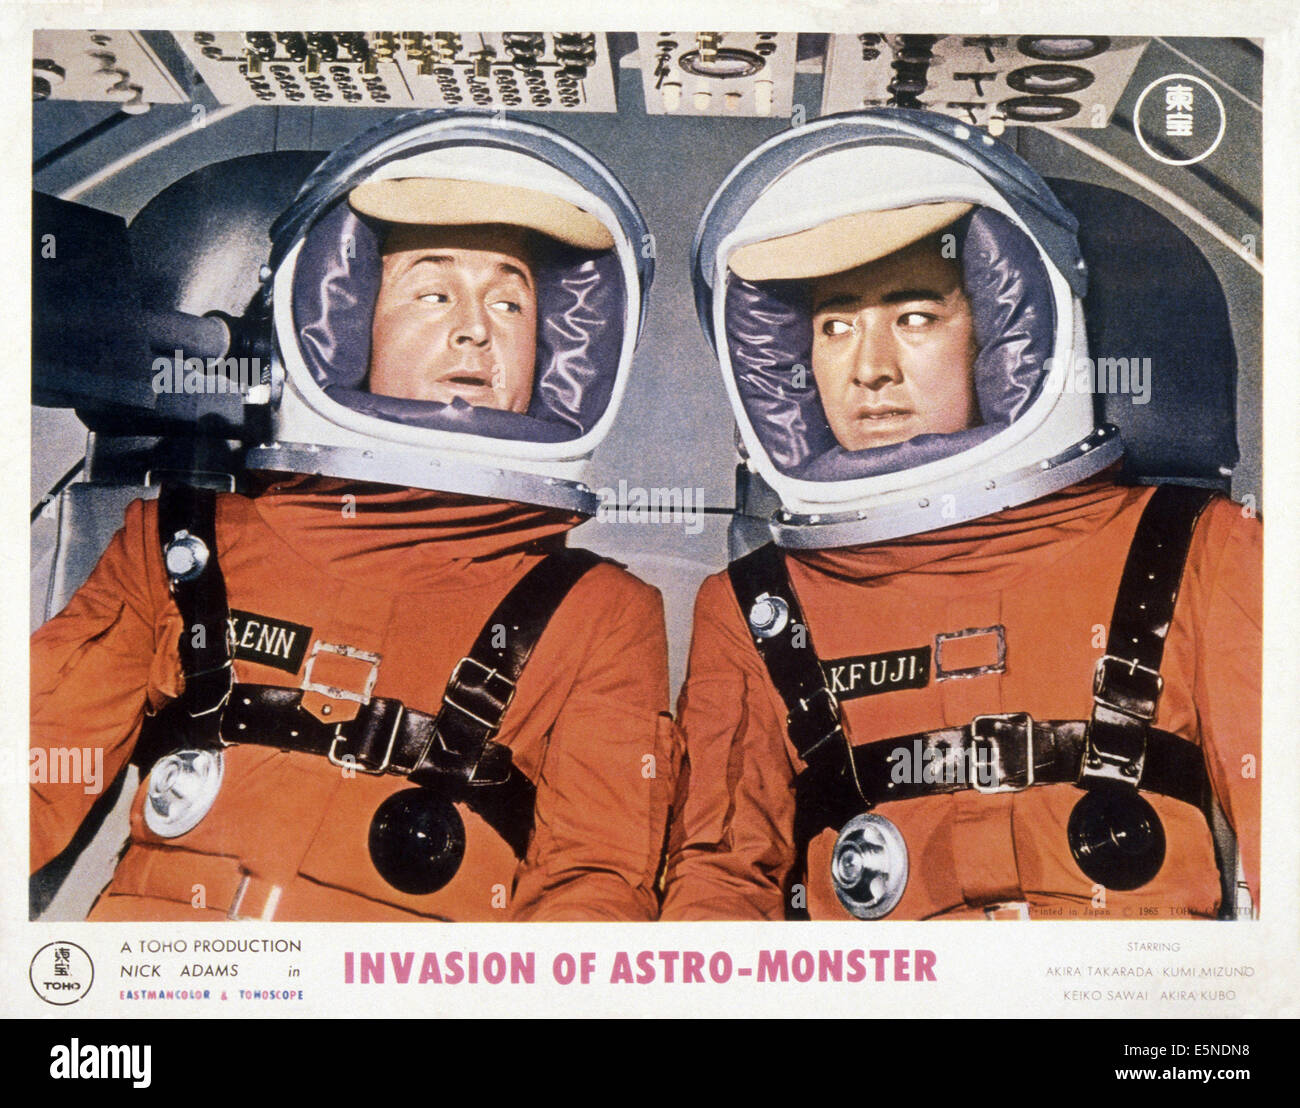 Invasione di astro-MONSTER, (aka KAIJU DAISENSO), da sinistra: Nick Adams, Akira Takarada, 1965 Immagini Stock